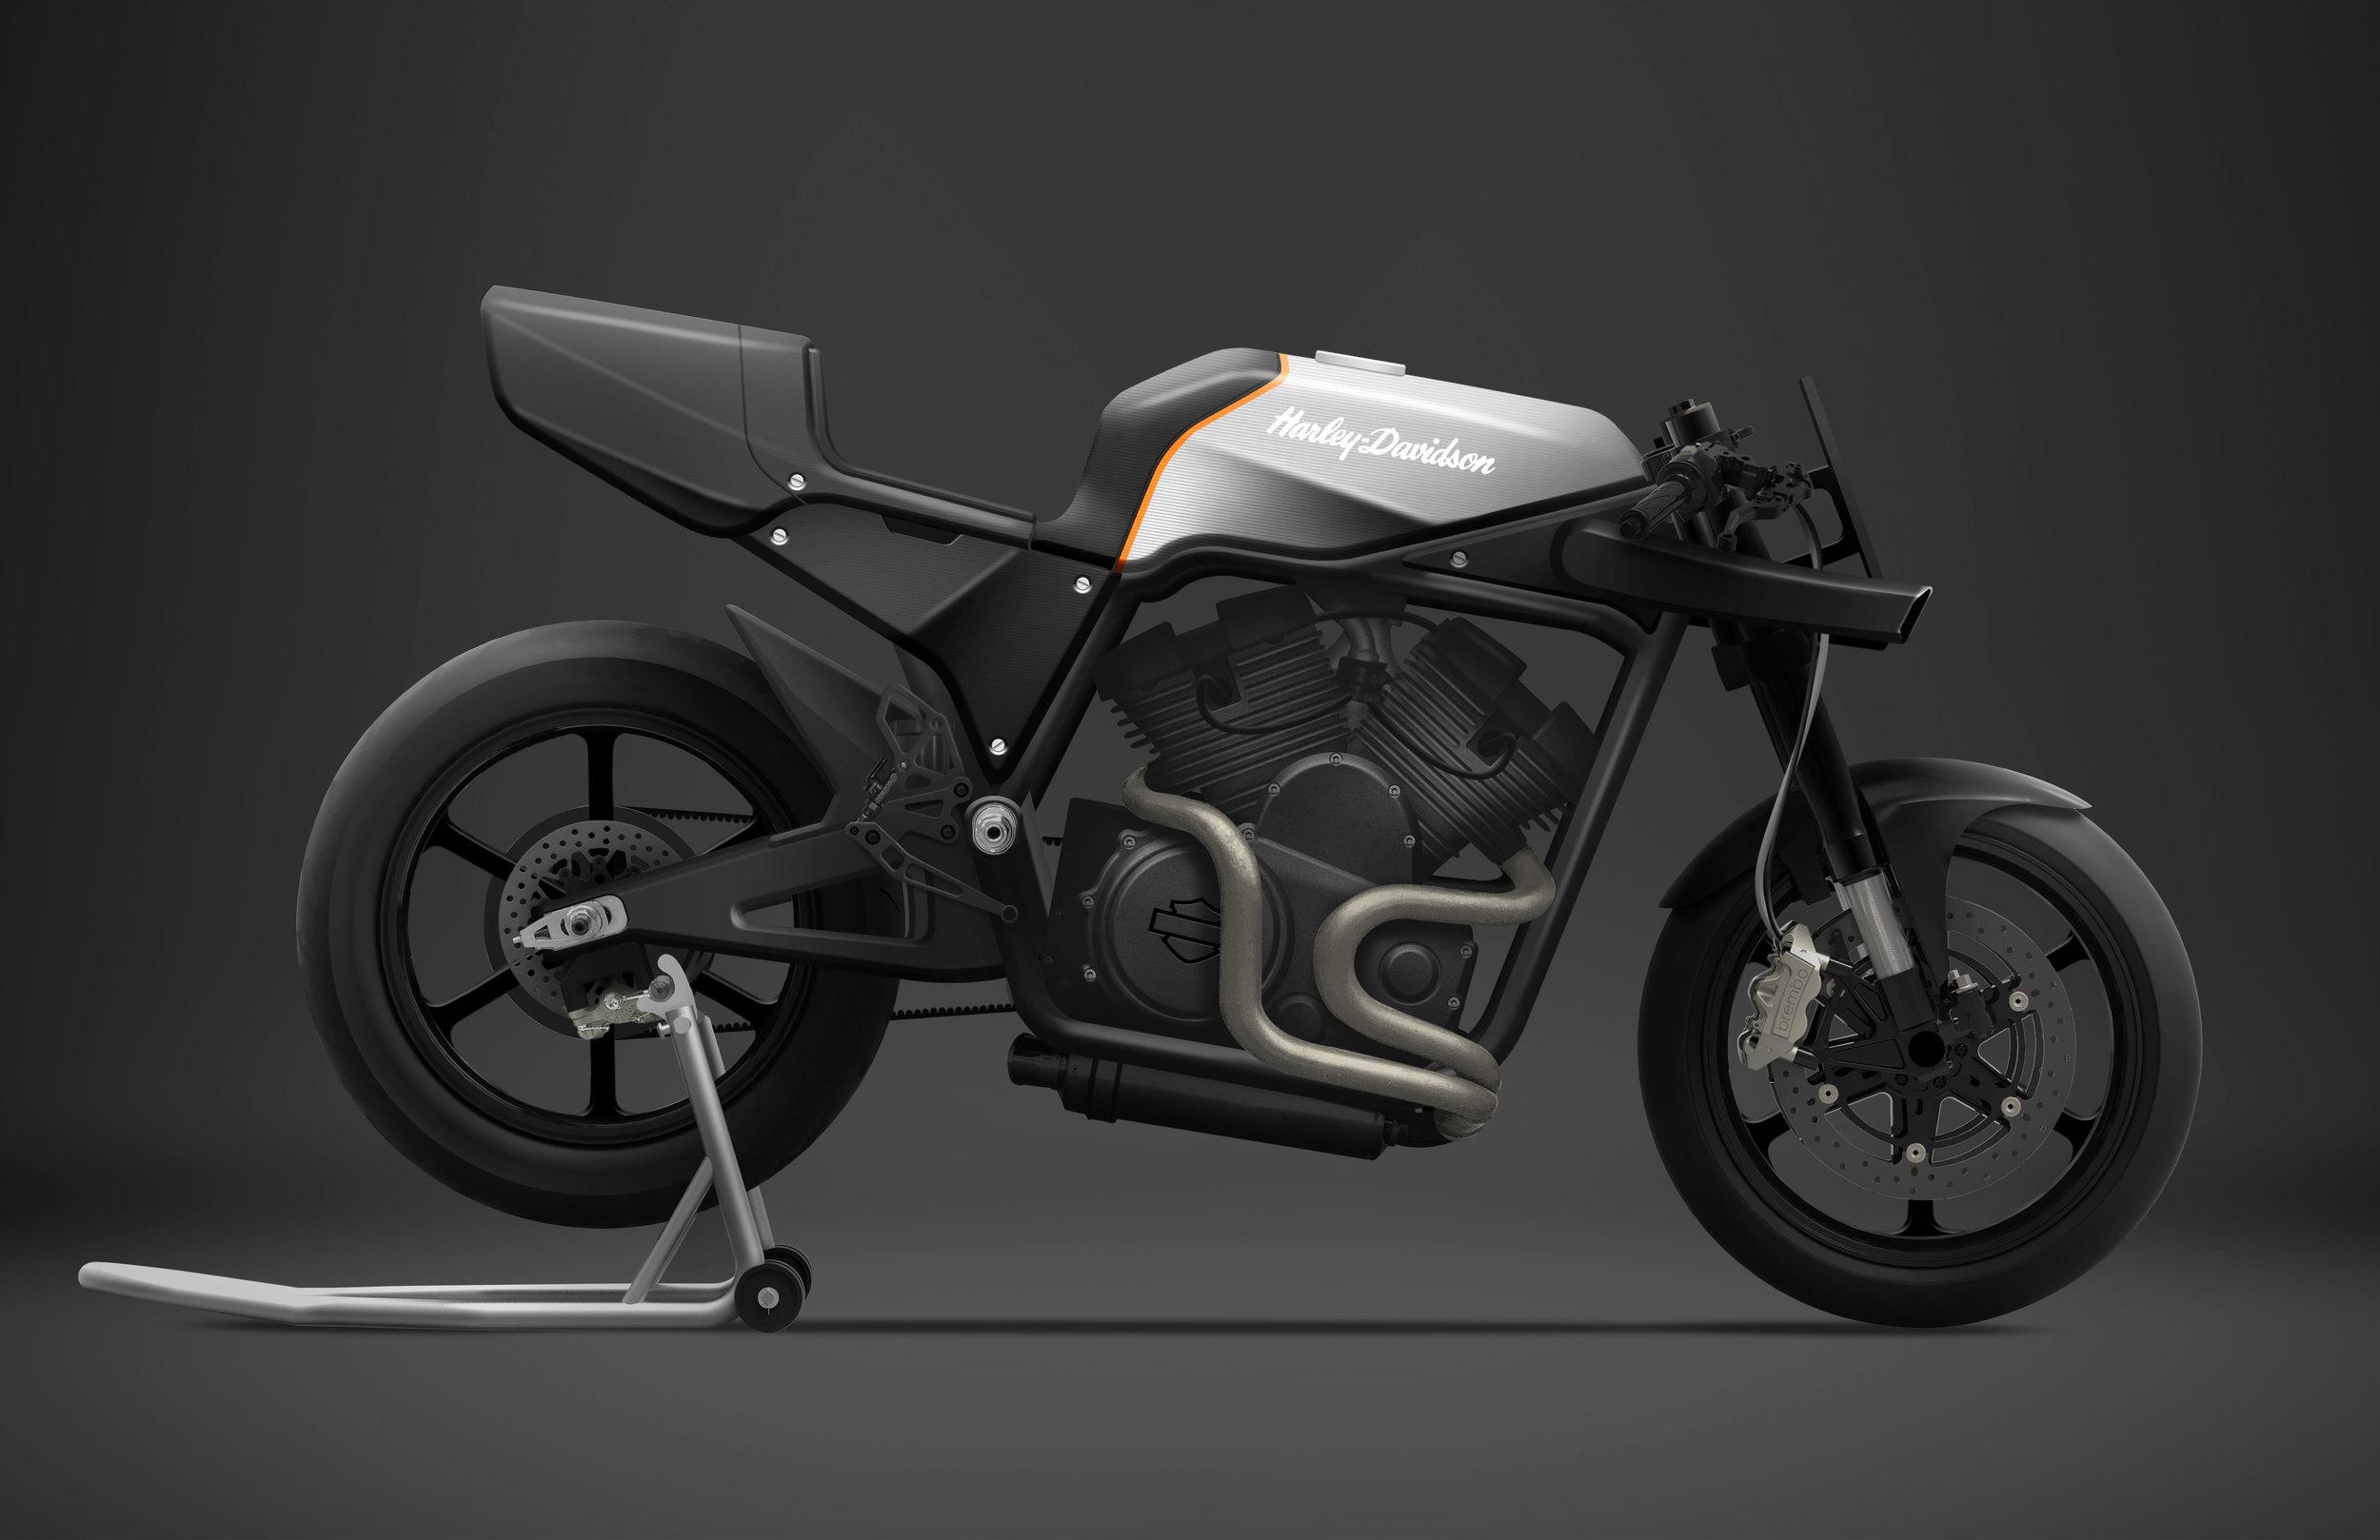 Harley Davidson Project Nova black background.jpg